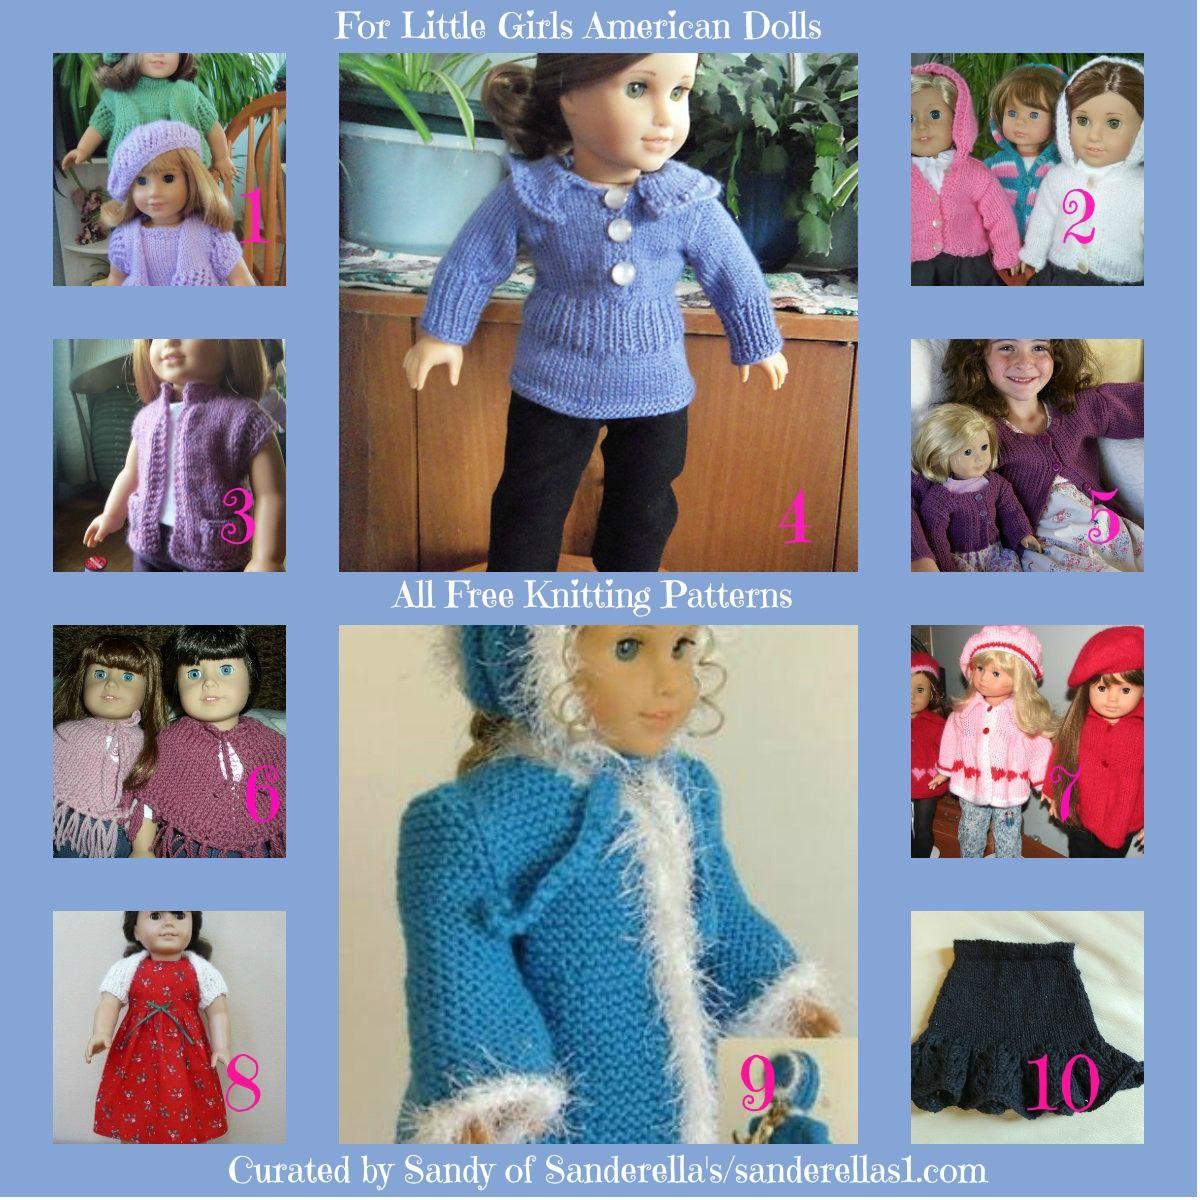 Free knitting patterns for American Girl Dolls sanderellas1.com ...